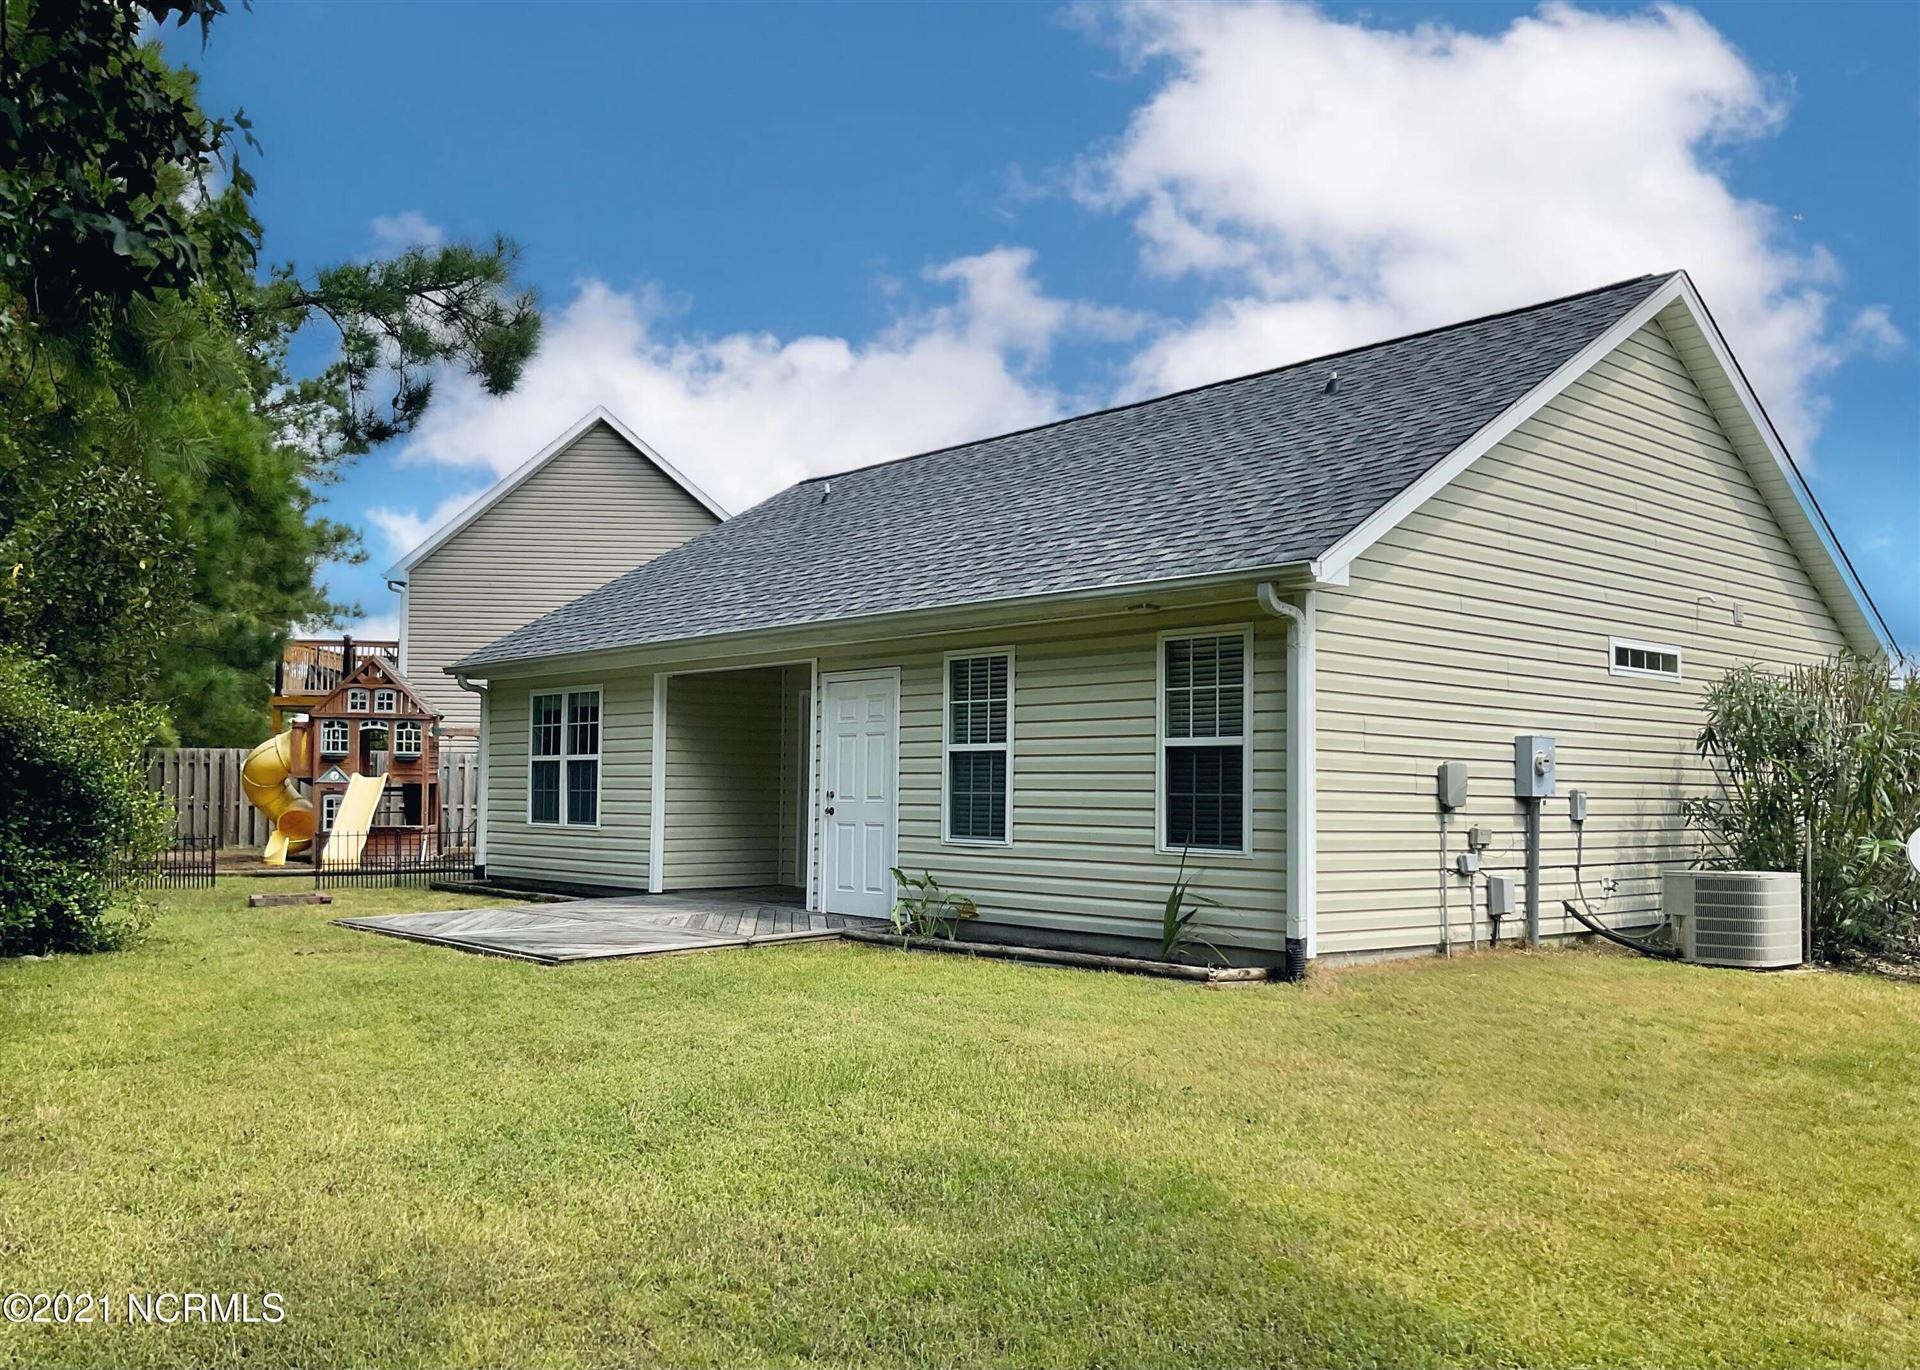 Photo of 759 Oak Branches Cl SE, Belville, NC 28451 (MLS # 100289800)